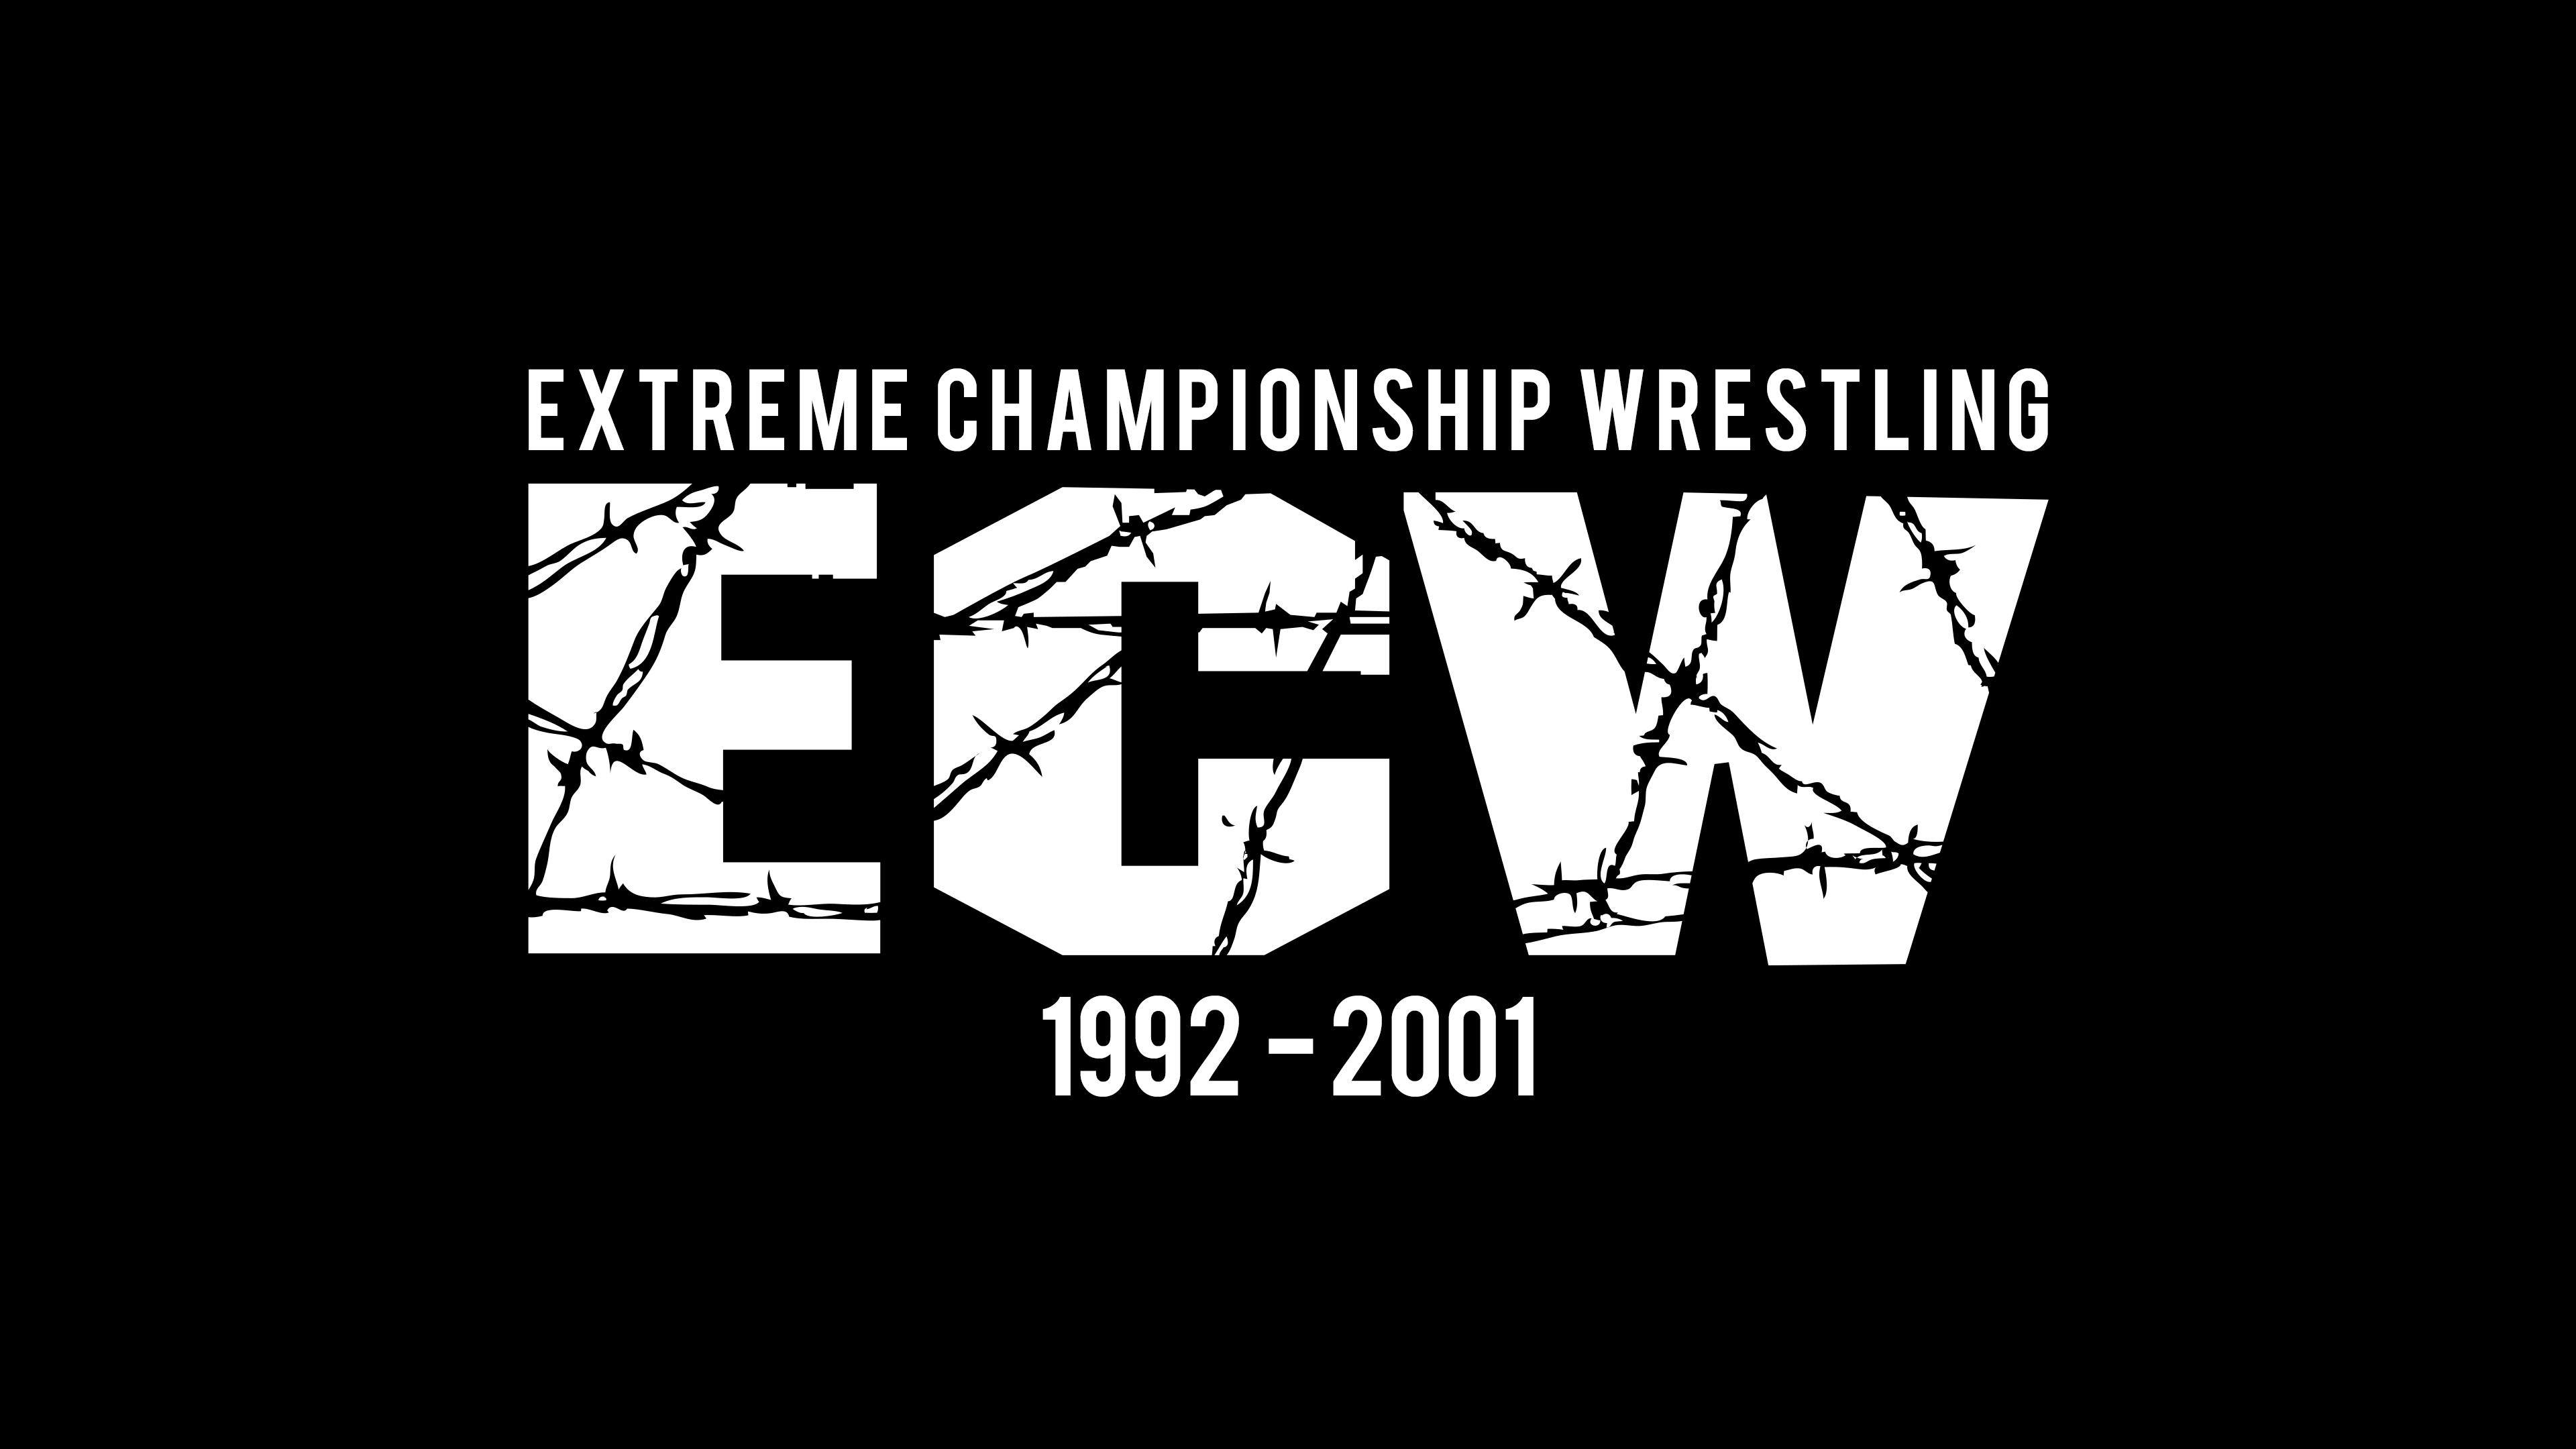 Typography Black Background Wrestling 3840x2160